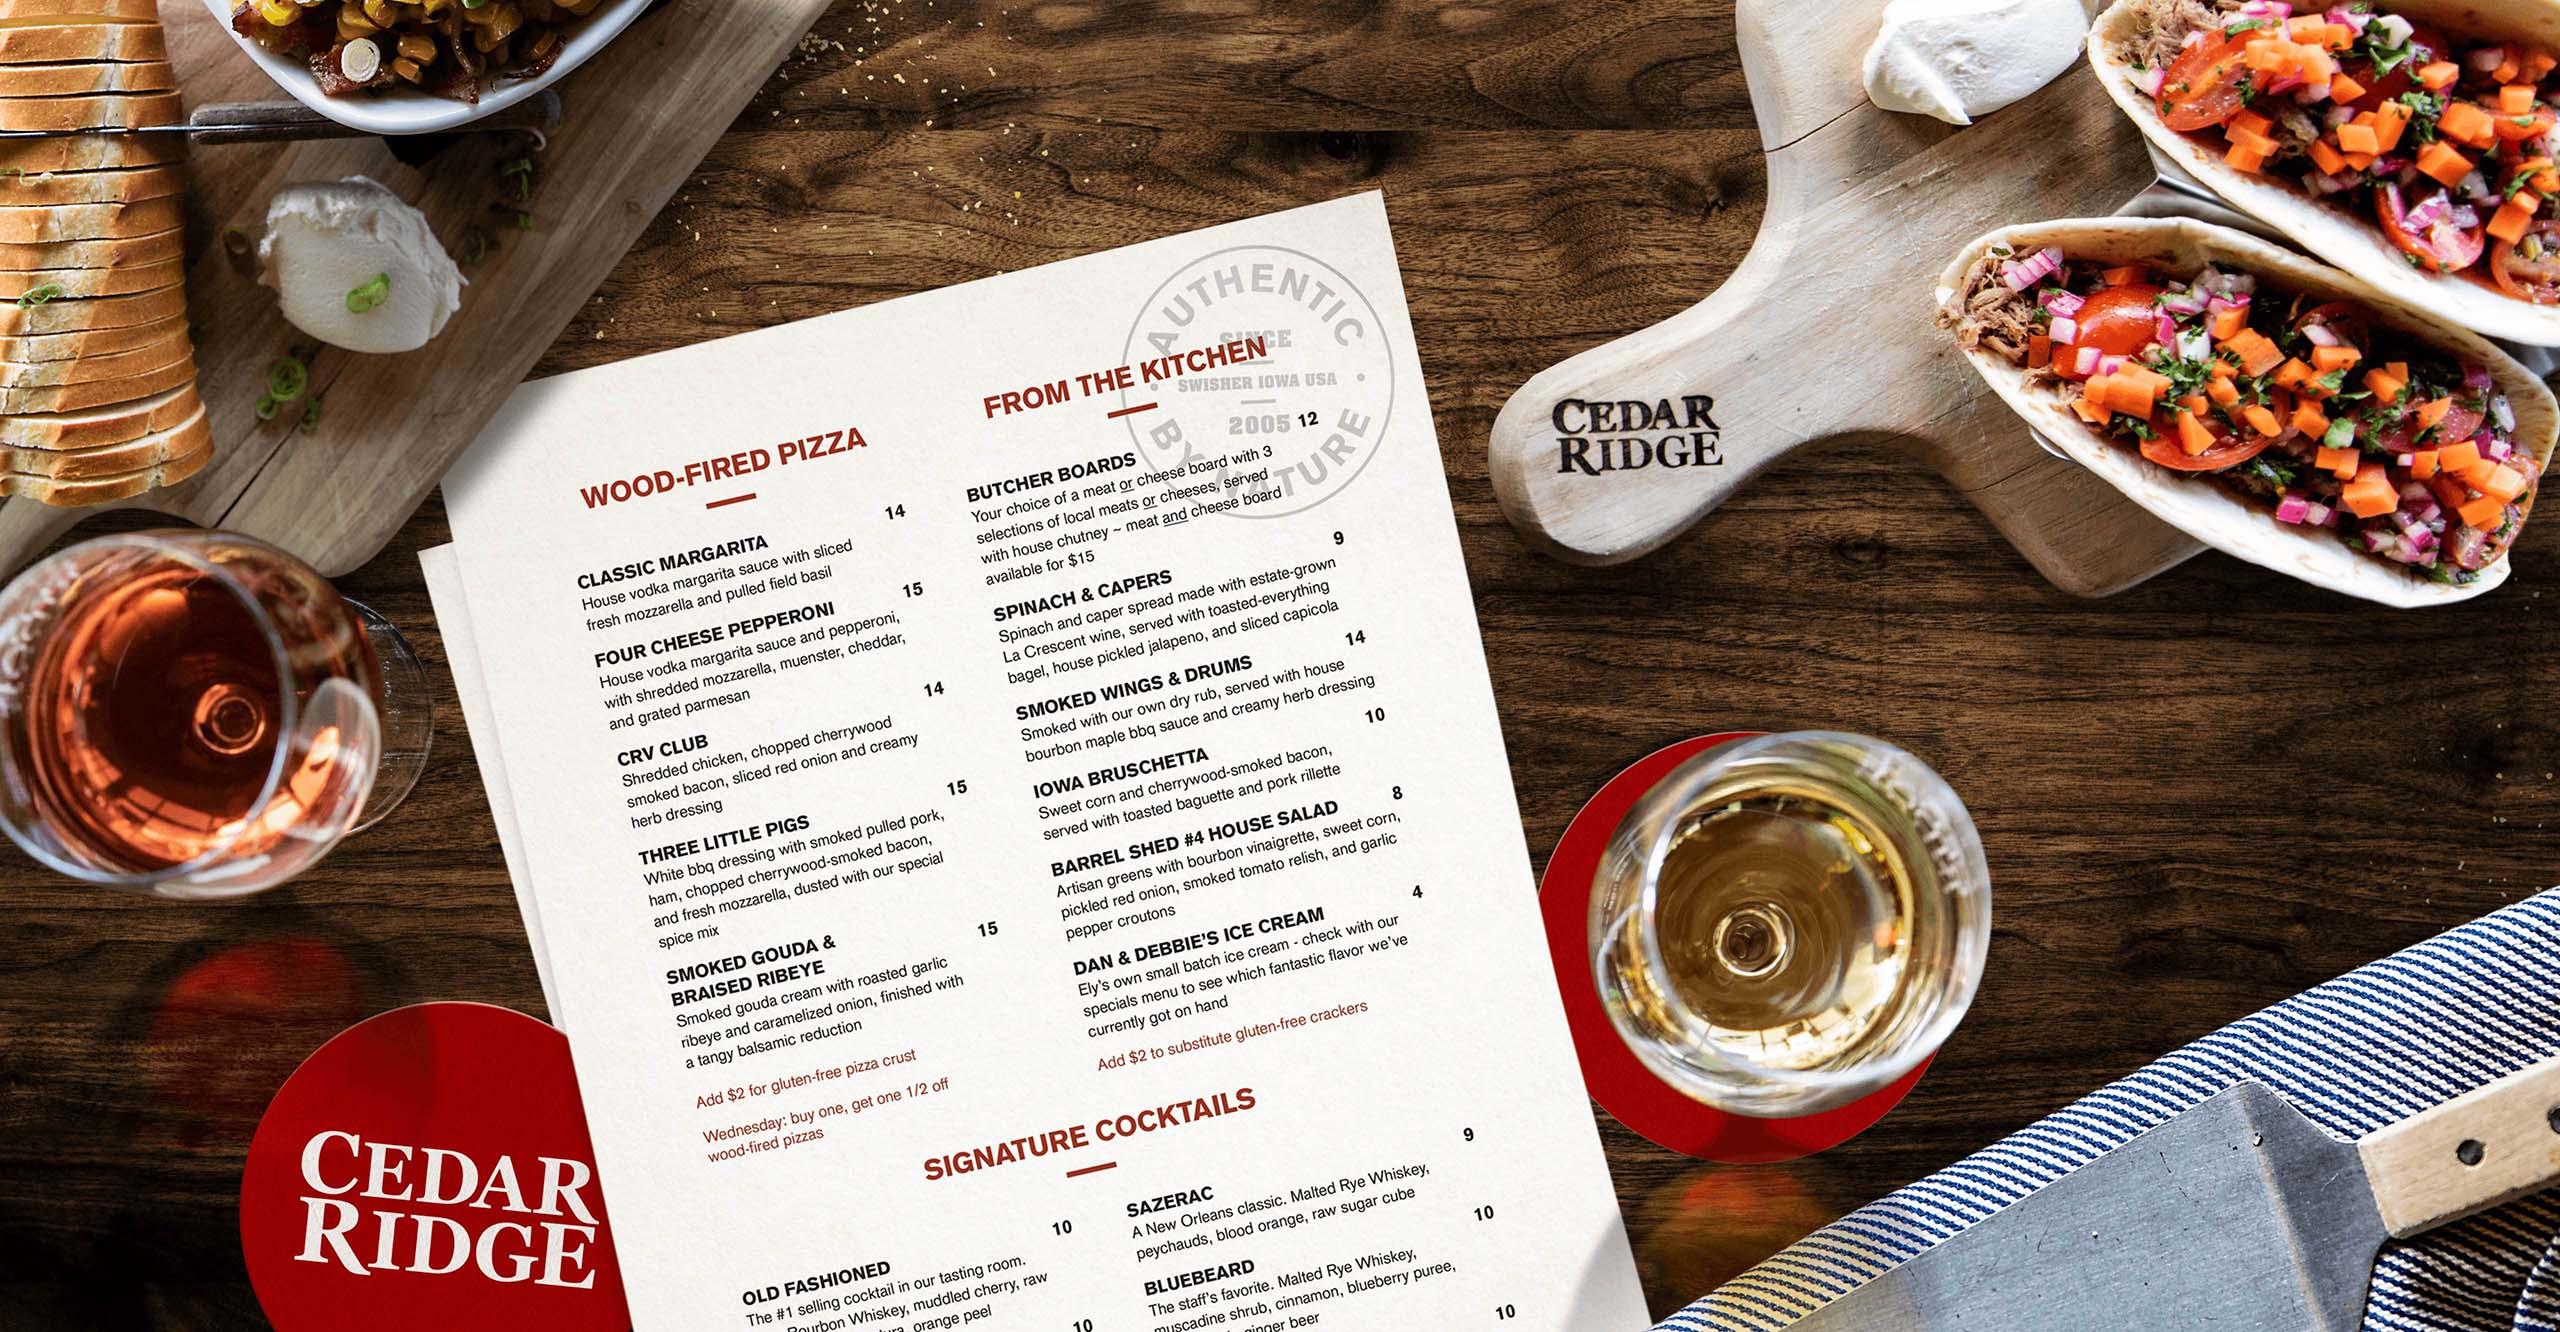 Cedar Ridge menu